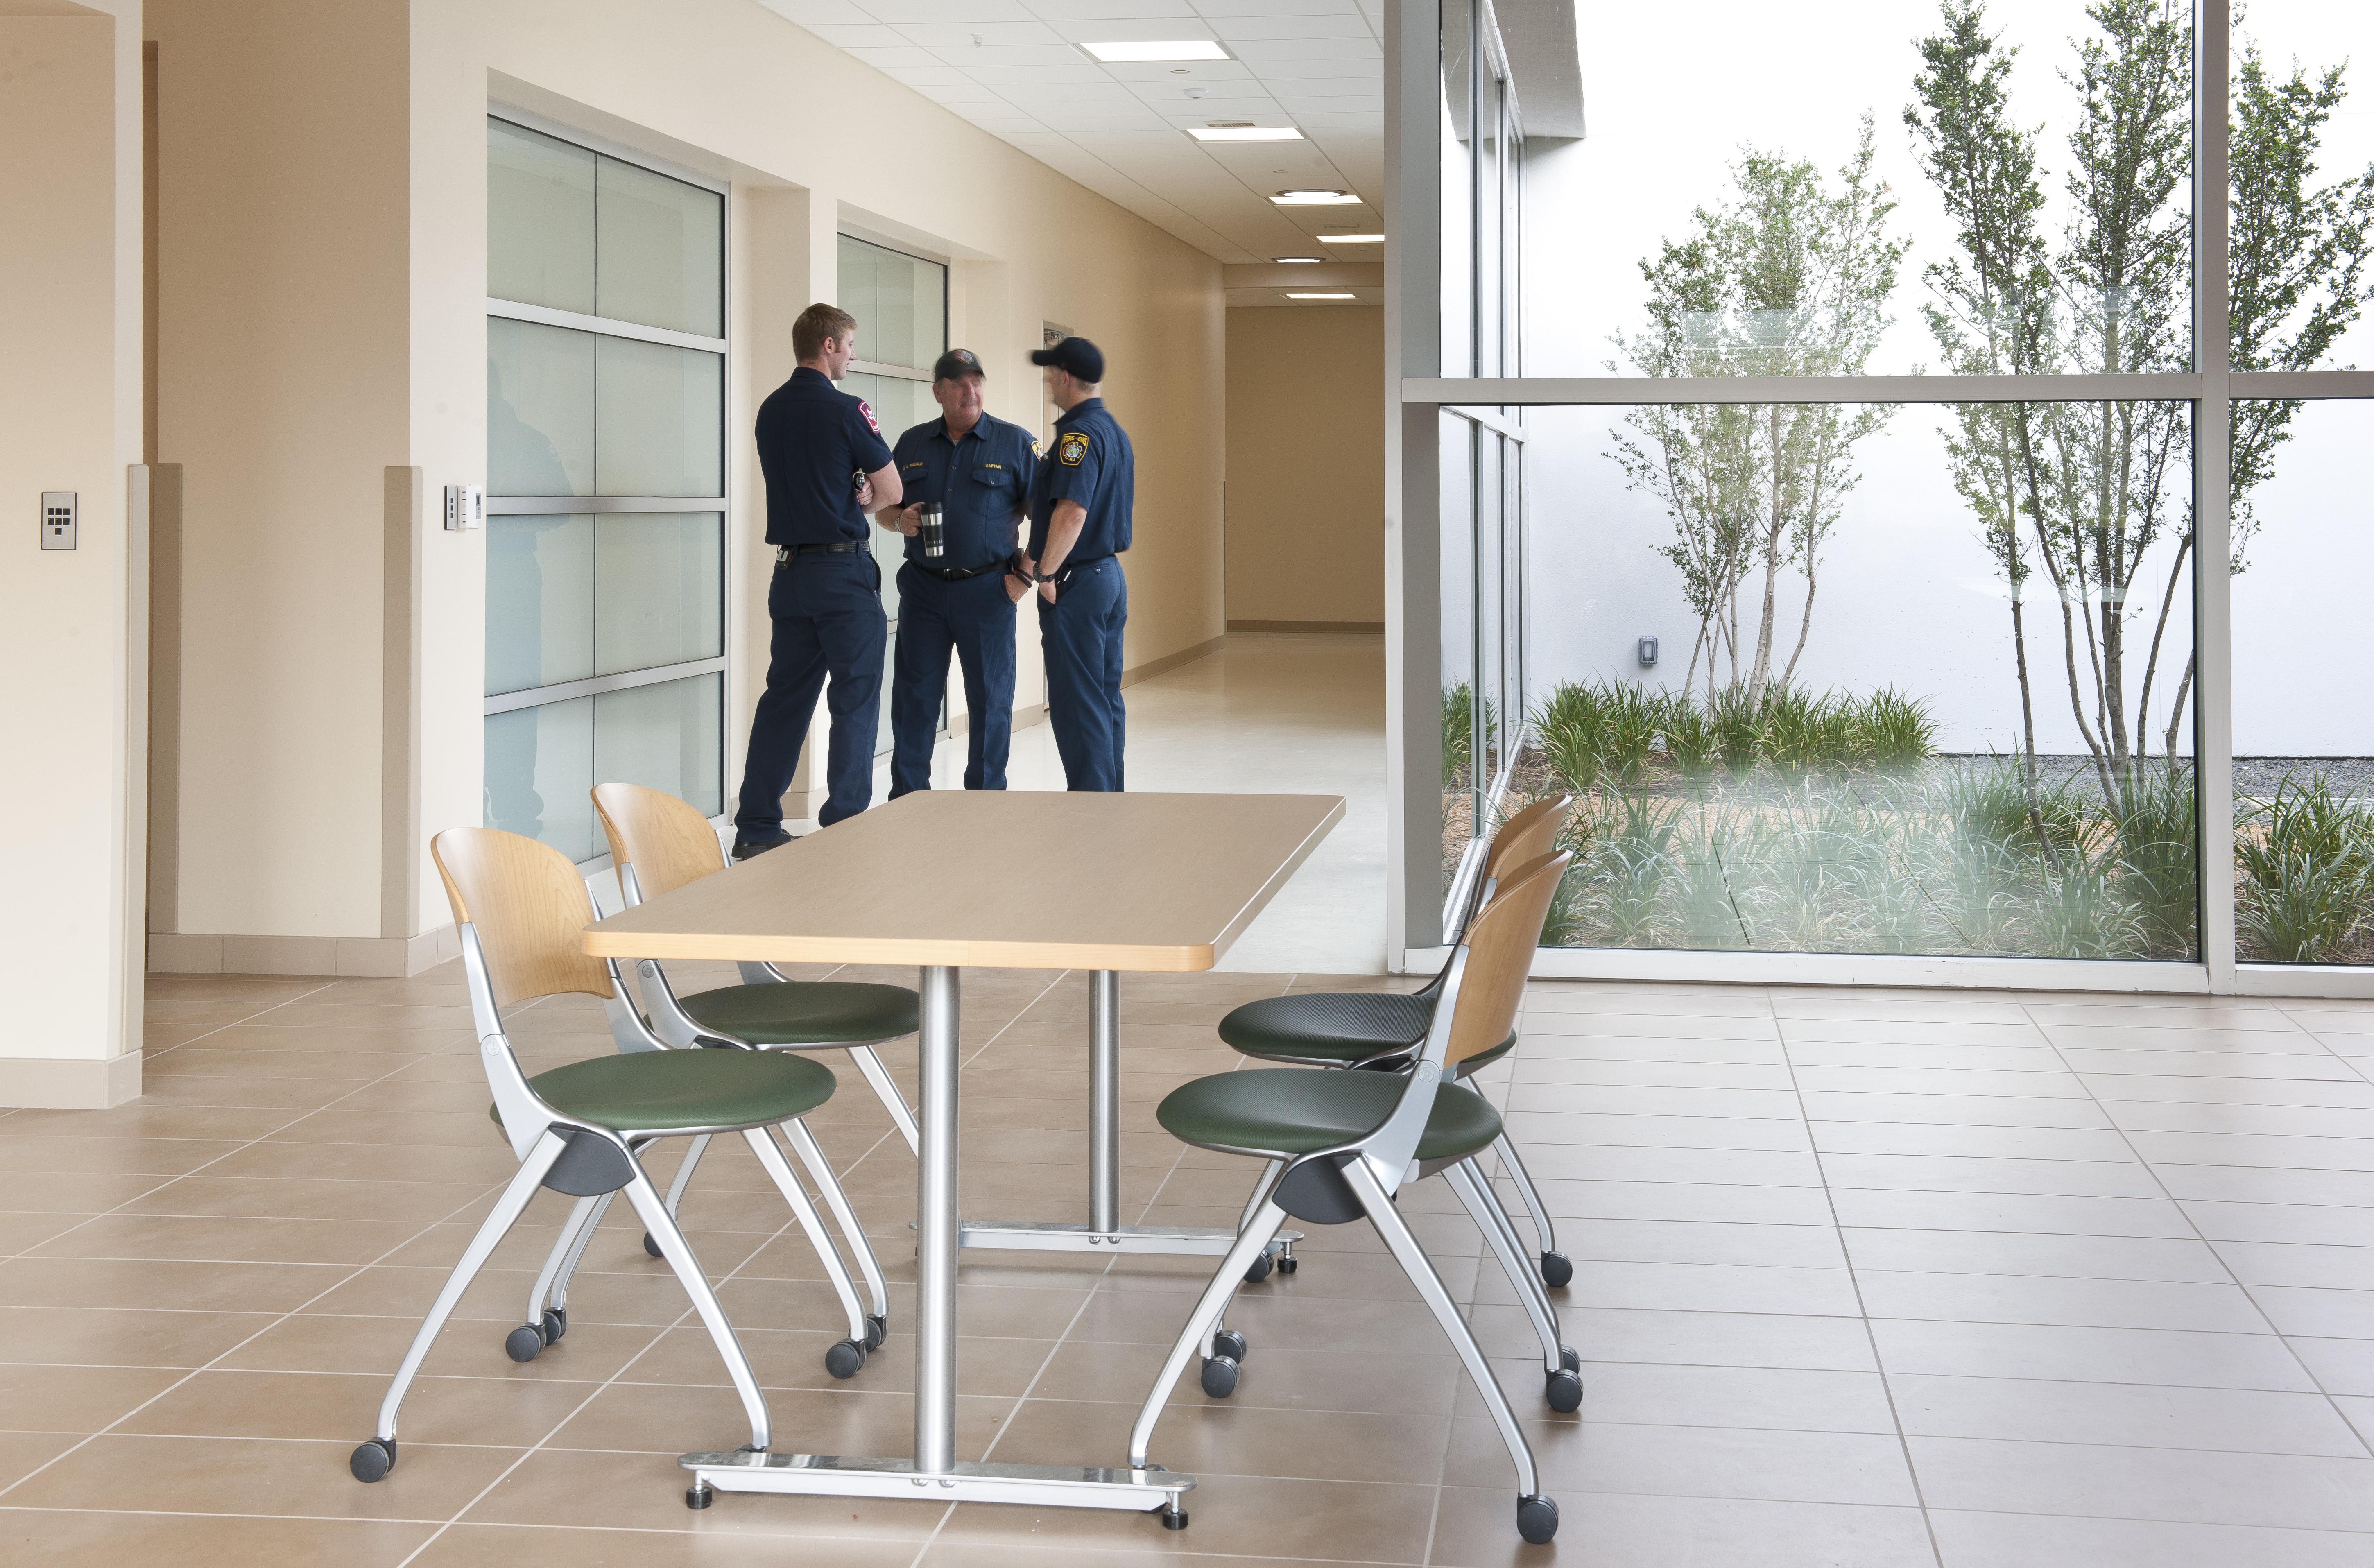 DFW Airport Precinct #6 Fire Station